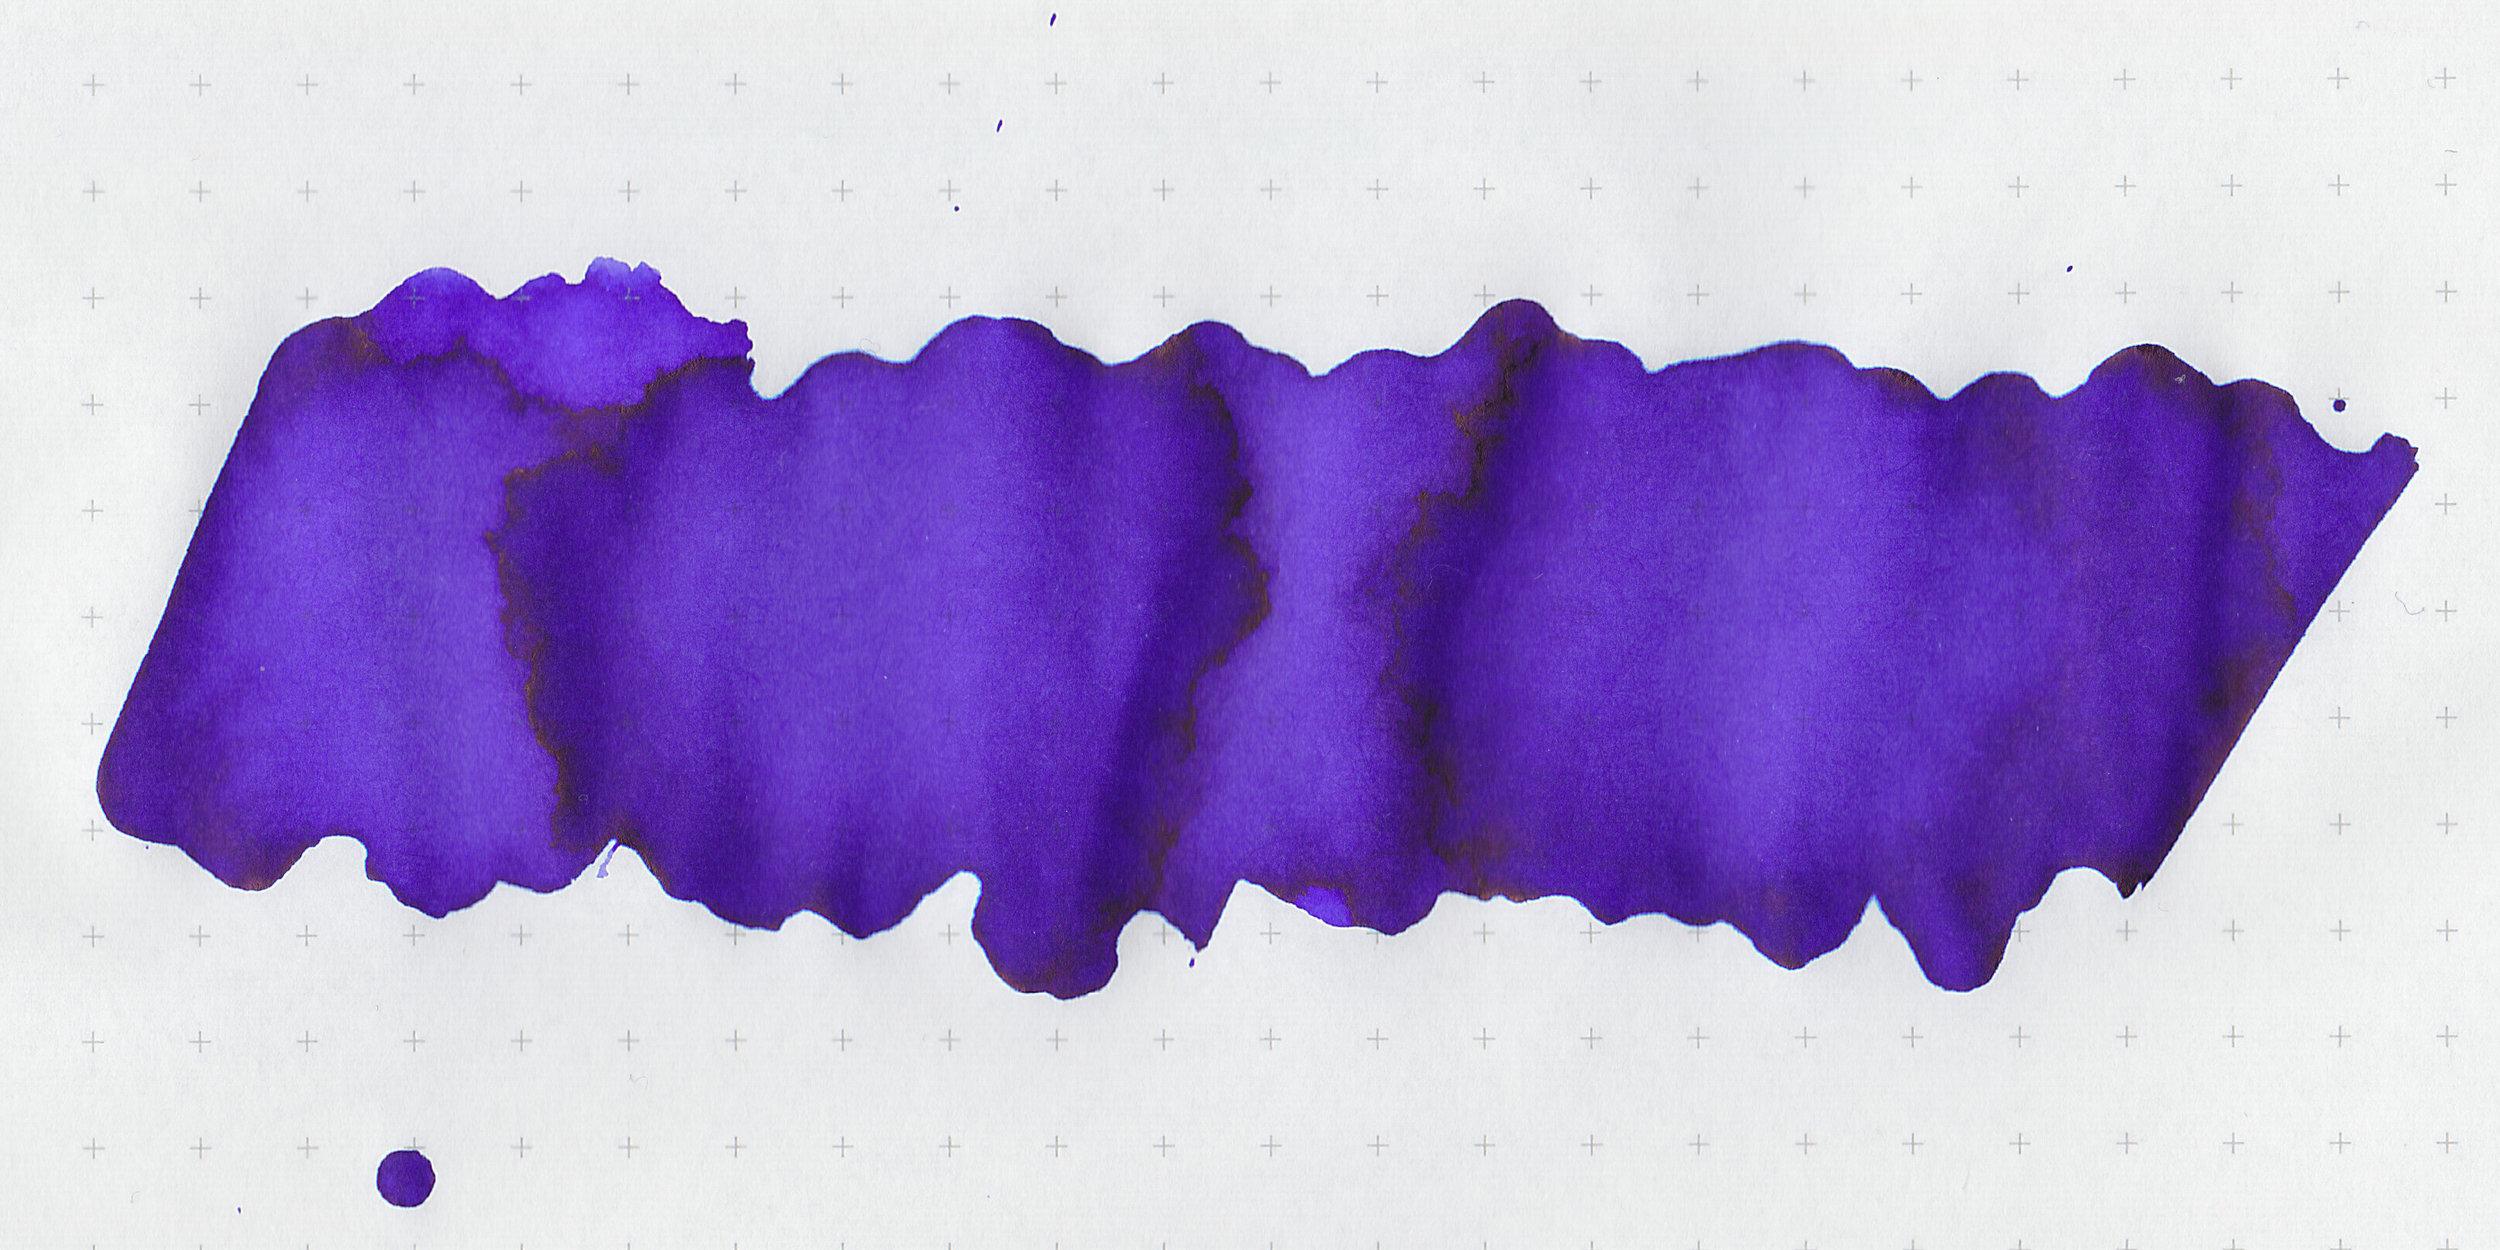 pr-cosmic-cobalt-15.jpg